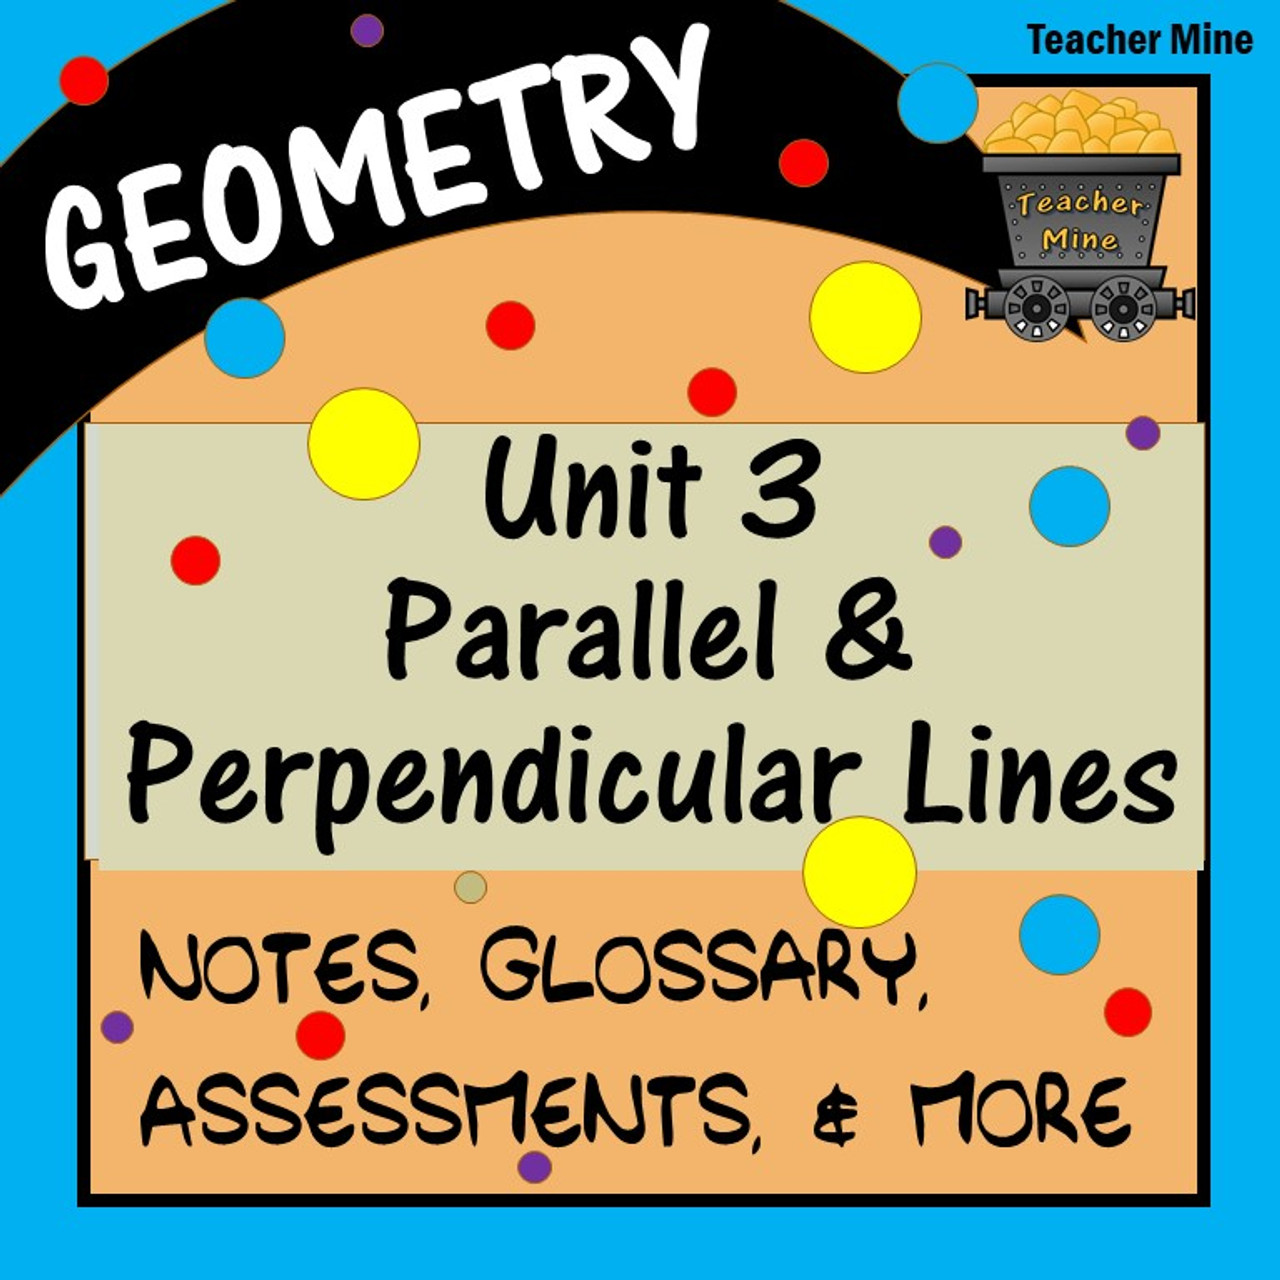 Parallel \u0026 Perpendicular Lines (Geometry - Unit 3) [ 1280 x 1280 Pixel ]